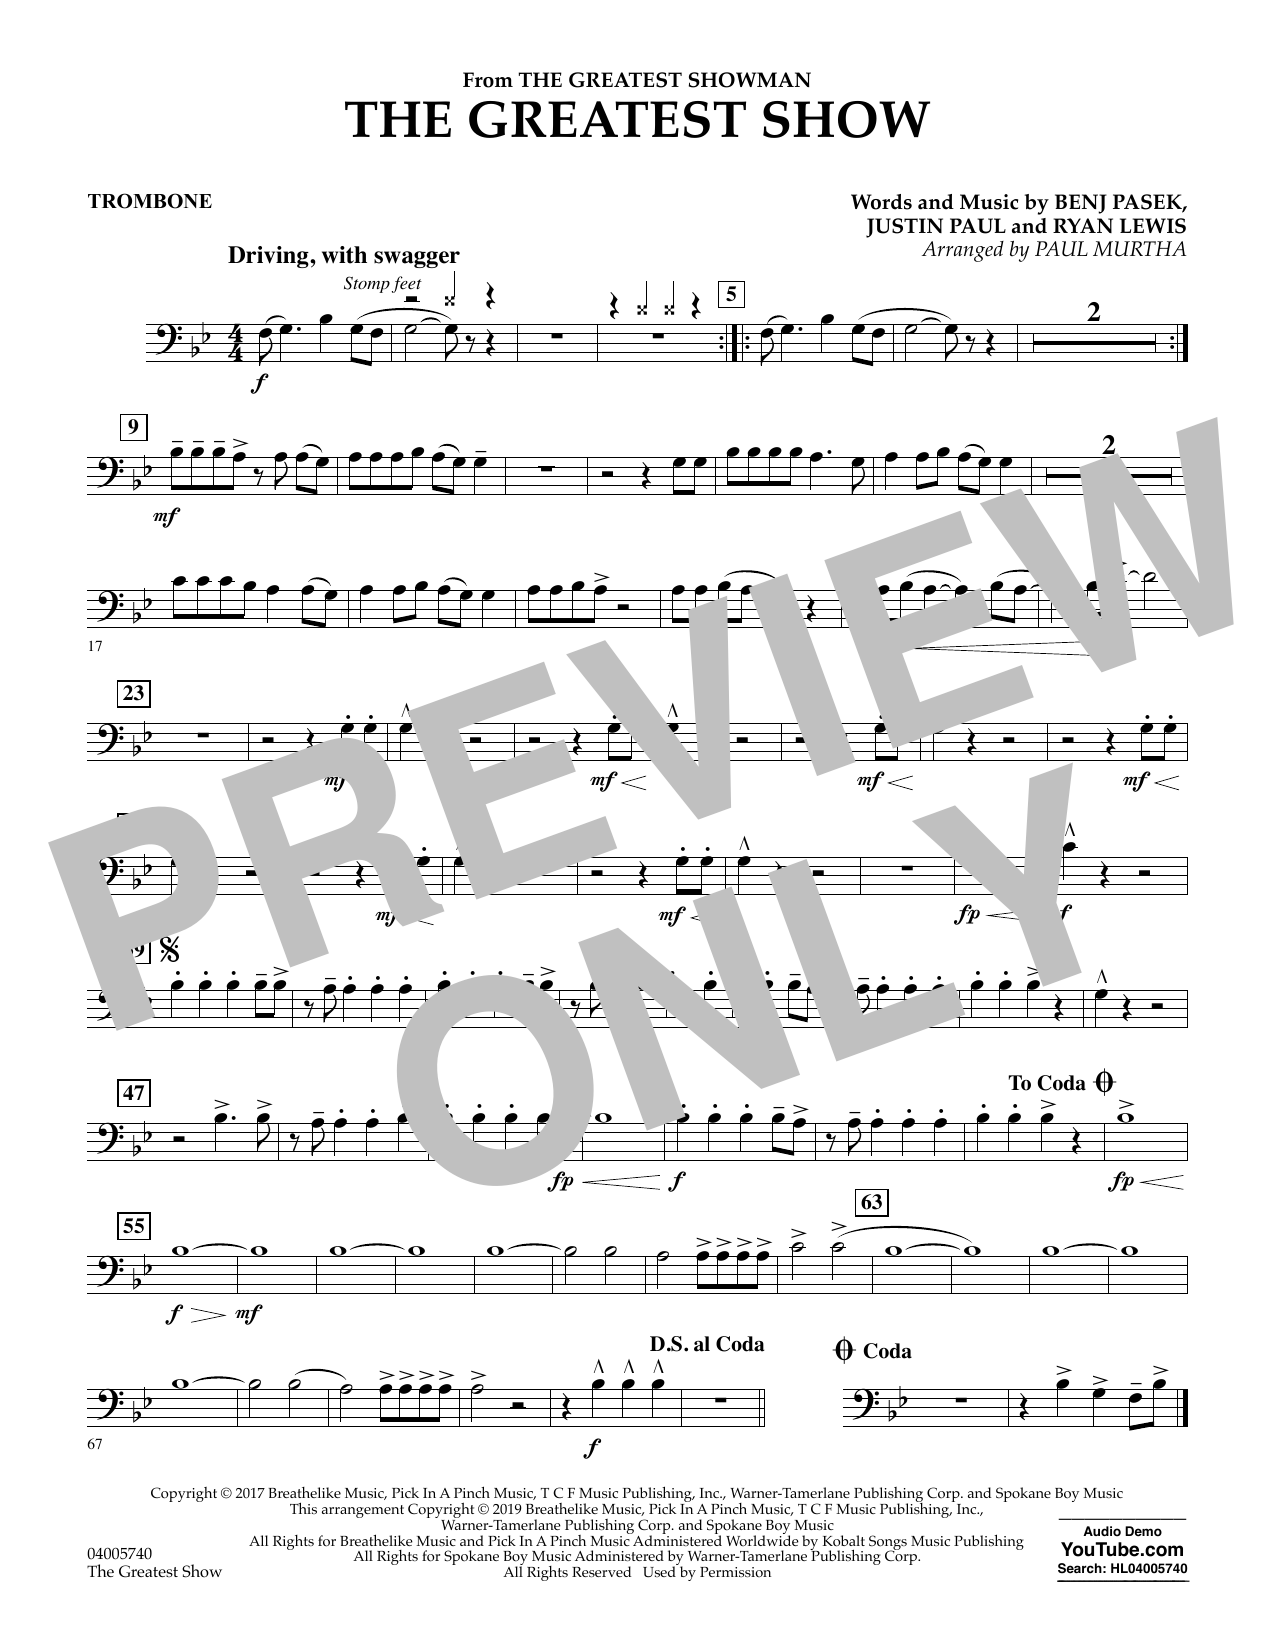 The Greatest Show  (arr. Paul Murtha) - Trombone (Concert Band)